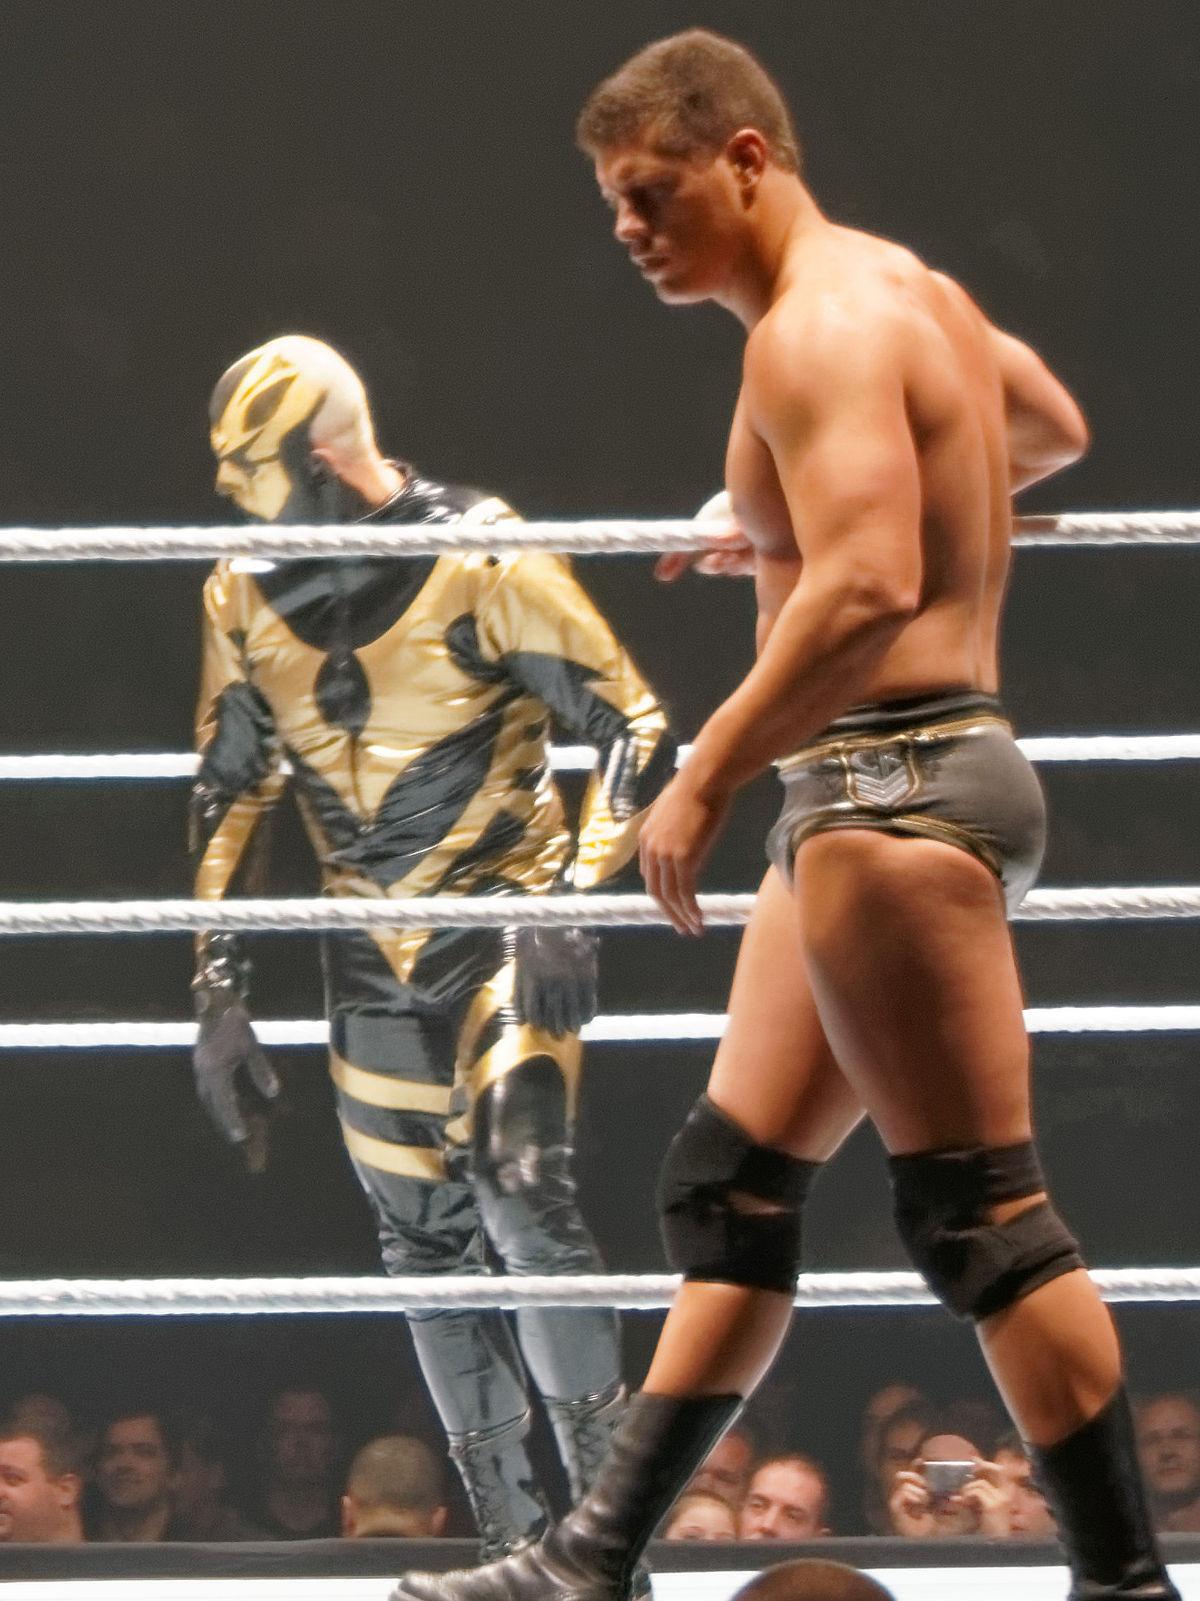 Cody Rhodes and Goldust - Wikipedia